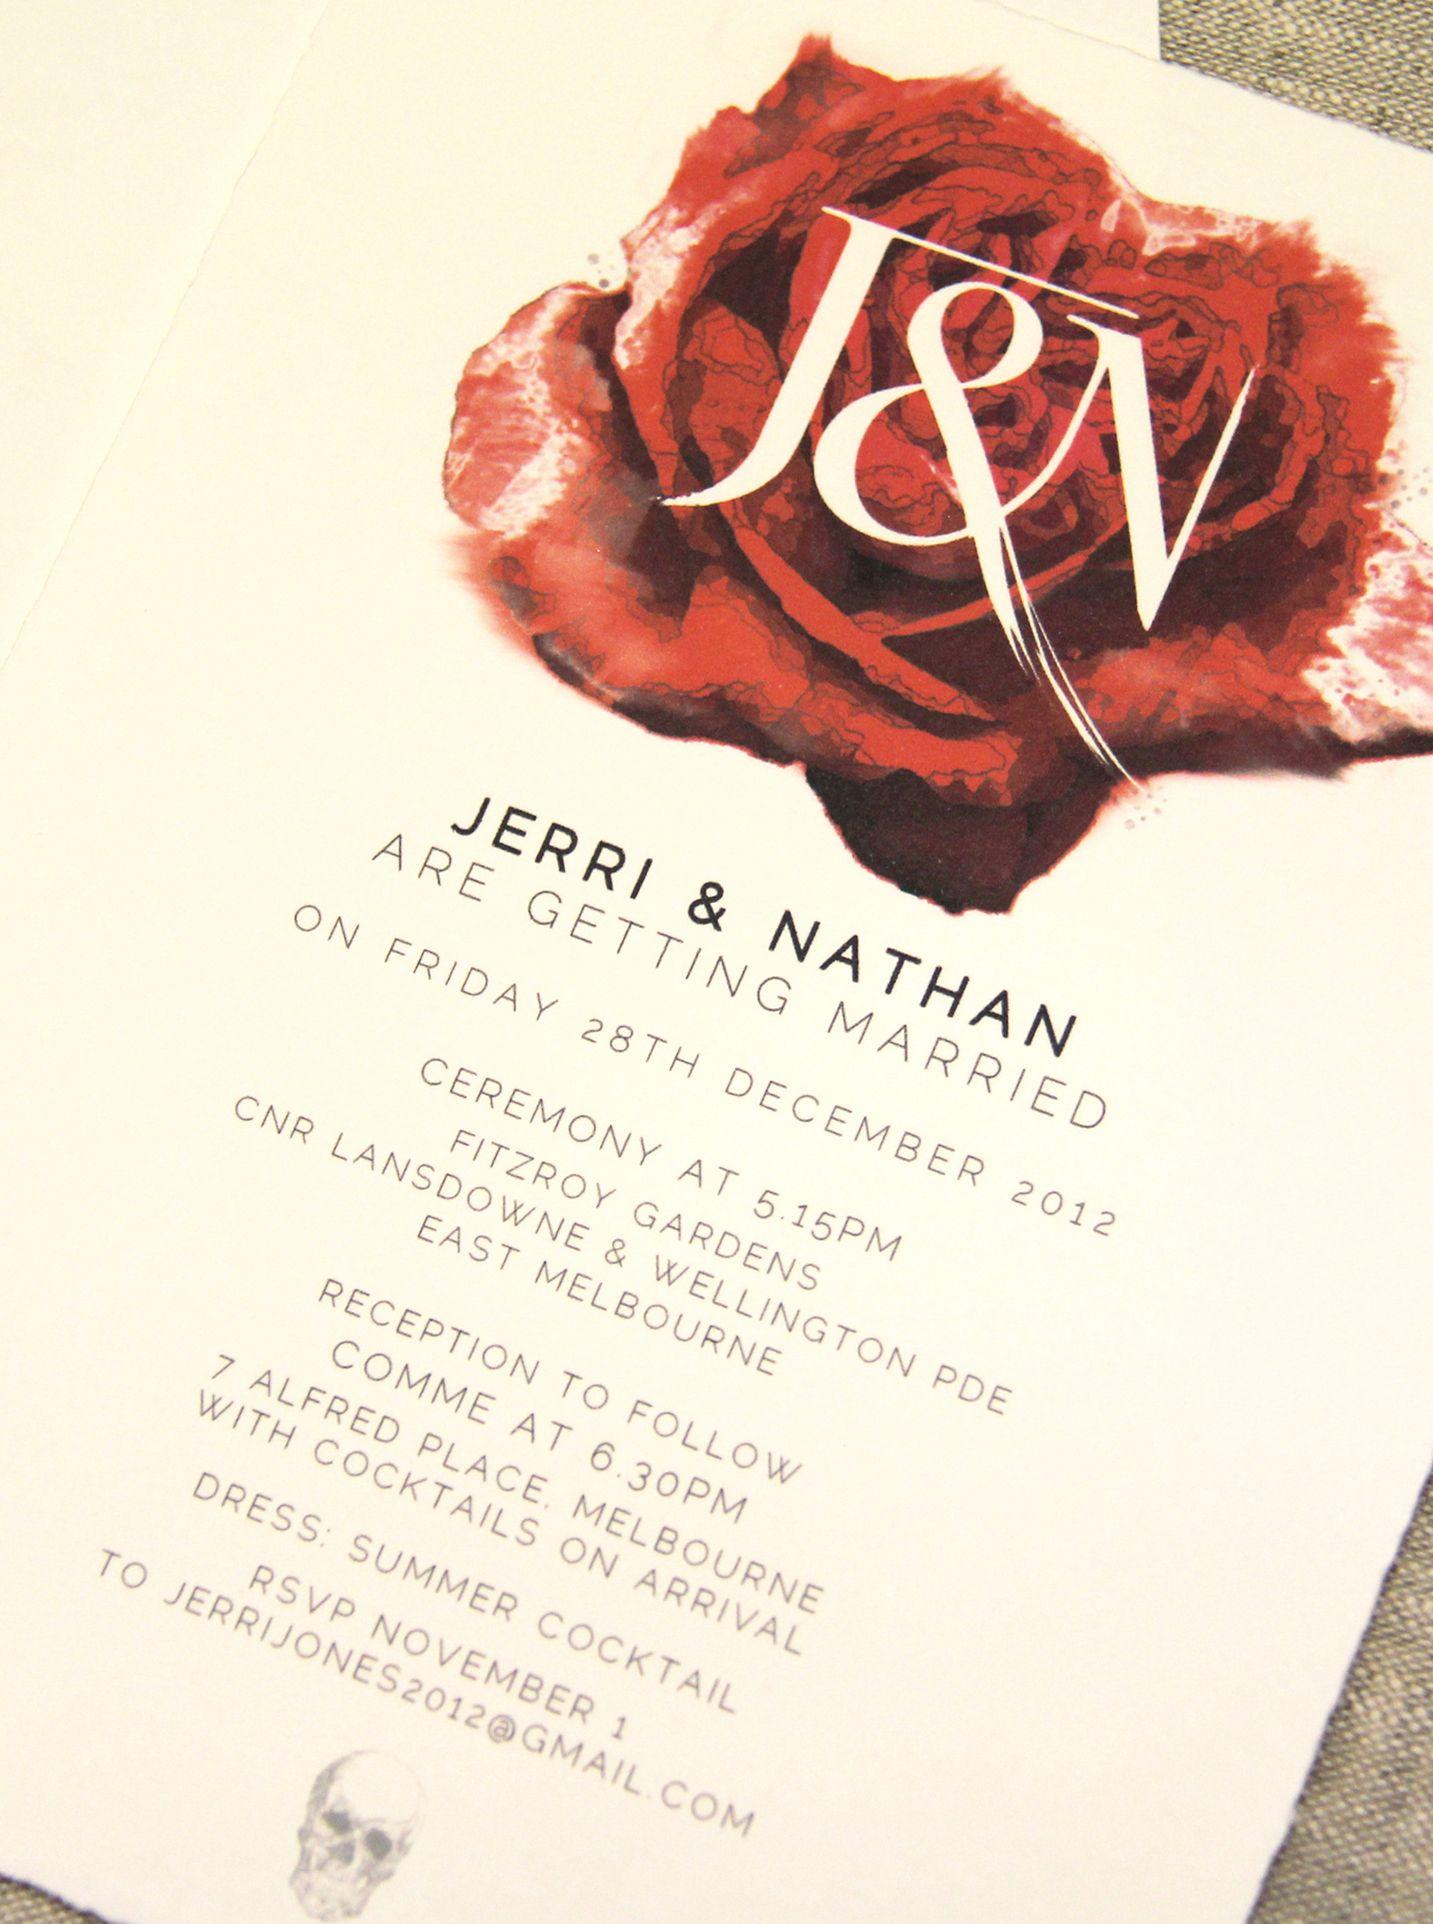 Unusual wedding invitation www.papyrusdesign.com | Weddings ...